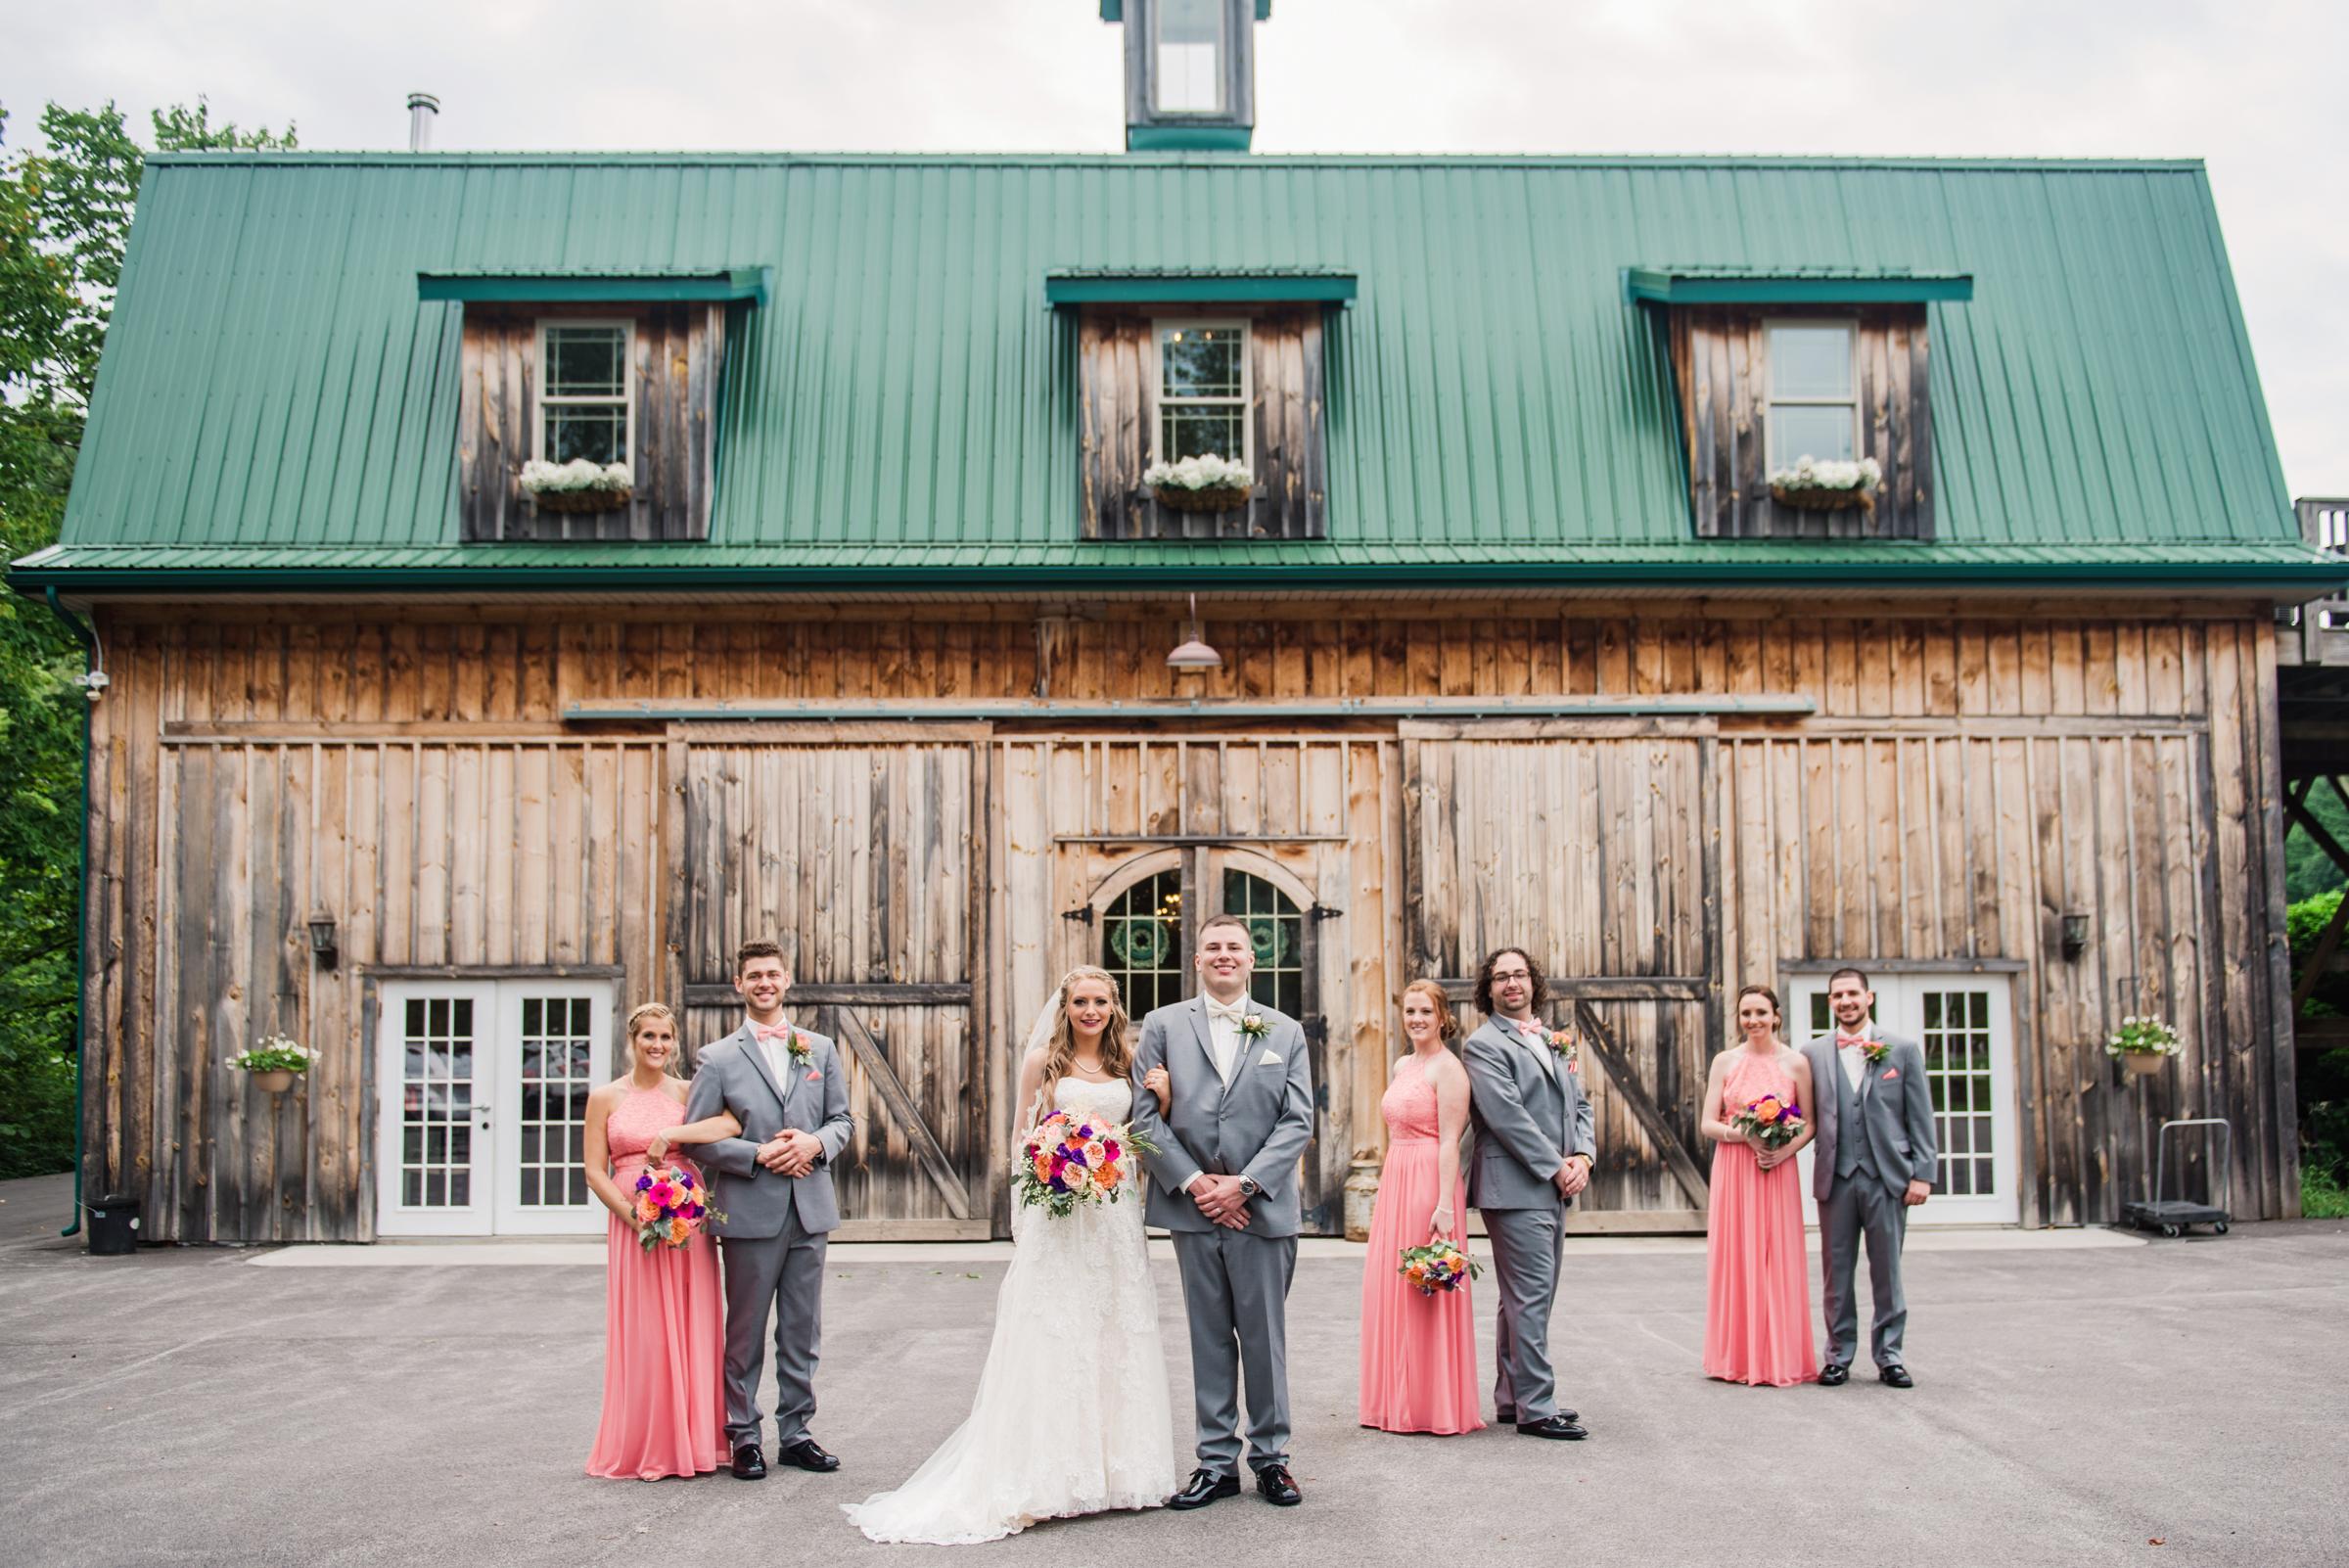 Wolf_Oak_Acres_Central_NY_Wedding_JILL_STUDIO_Rochester_NY_Photographer_DSC_8619.jpg